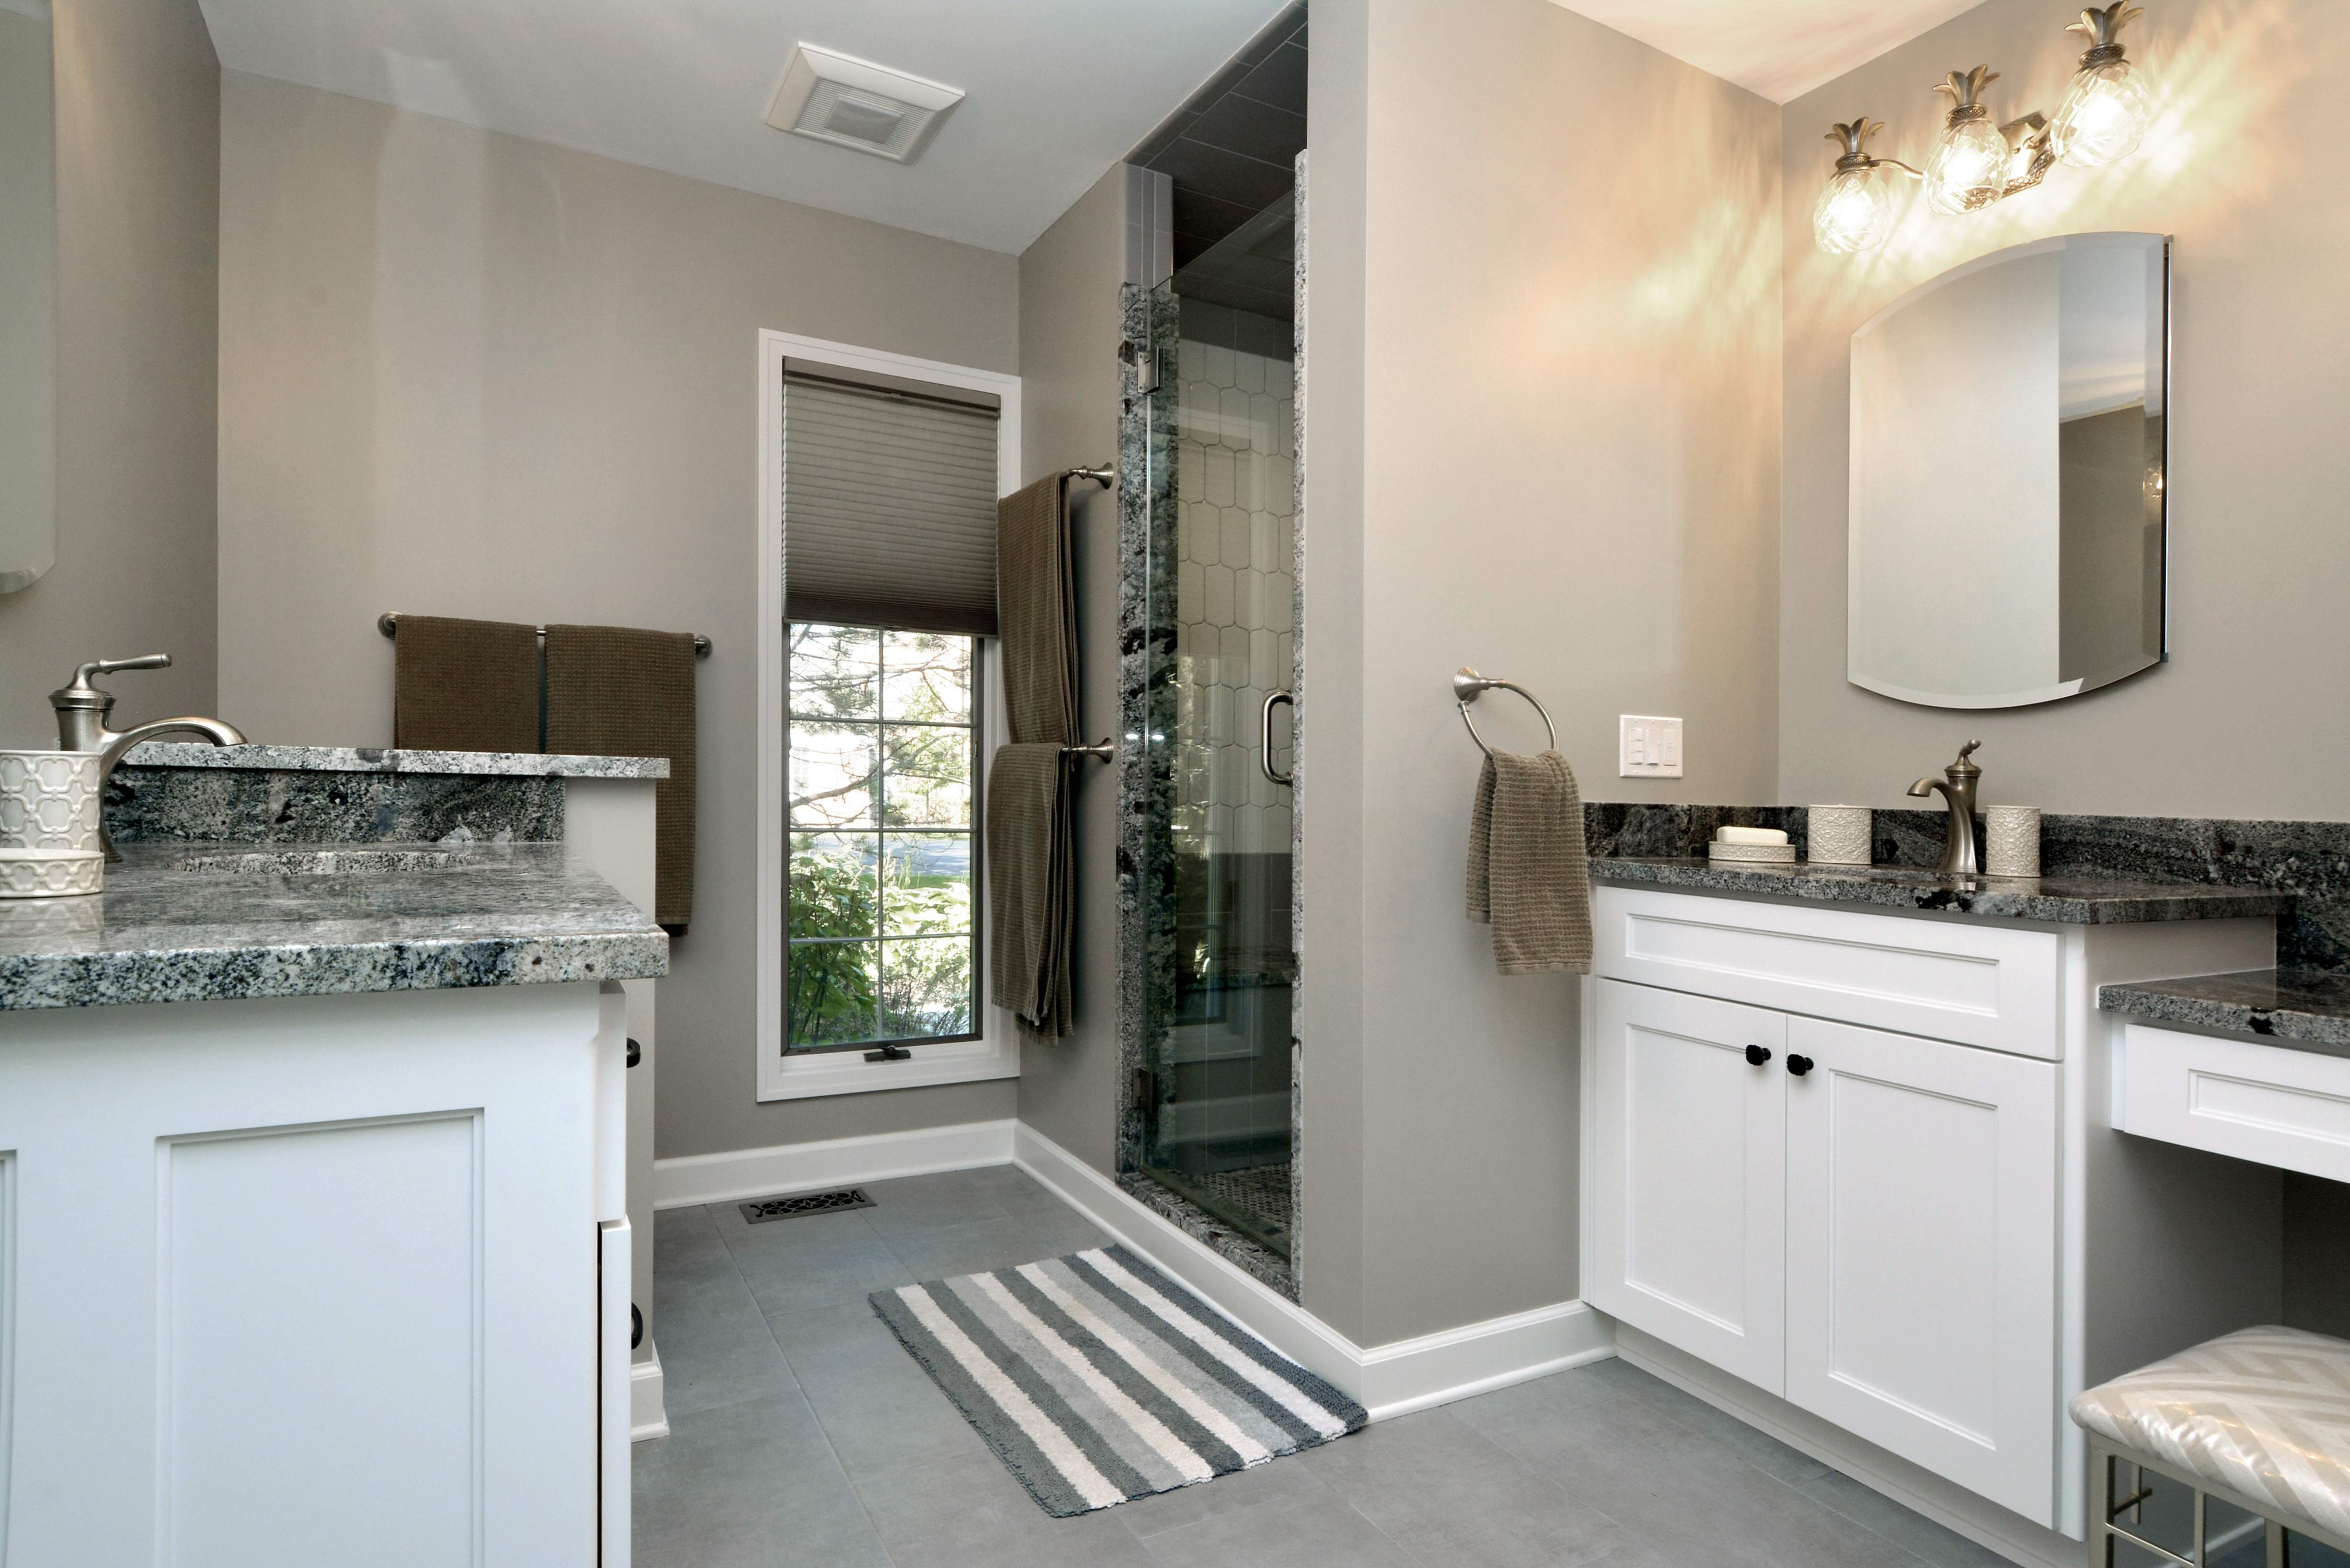 Bathroom Remodeling Contractors Inverness IL